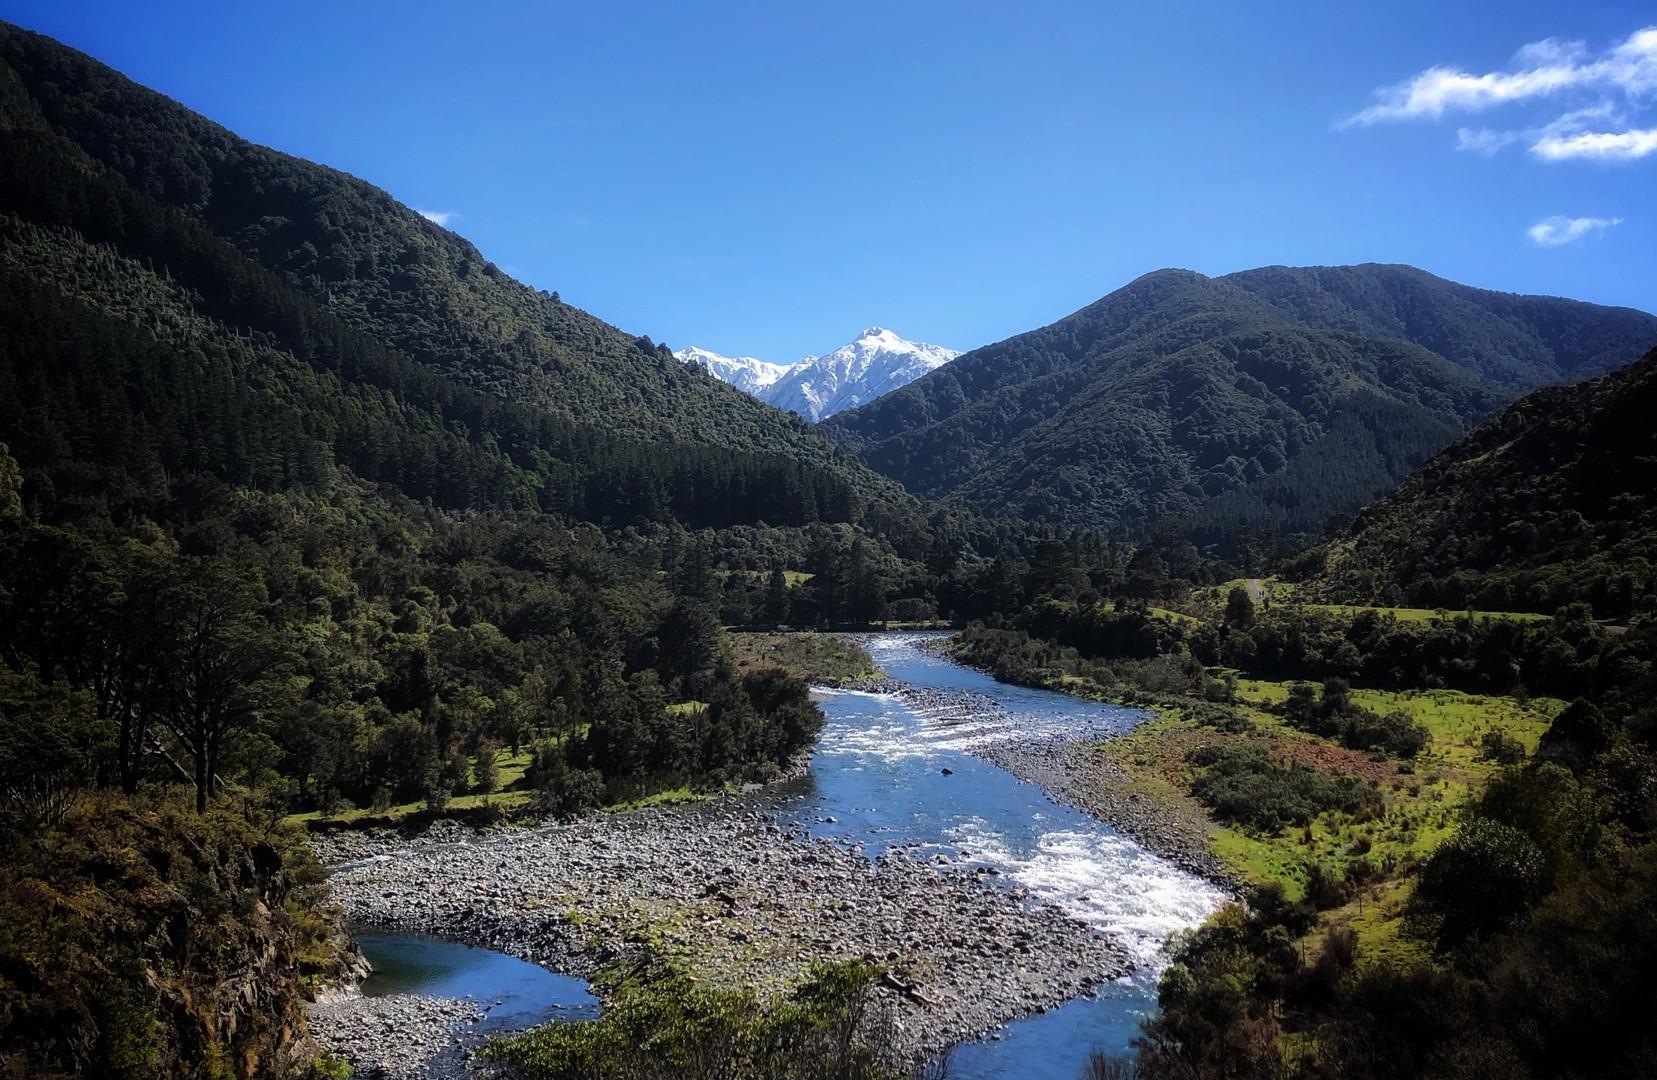 Tararua Forest Park